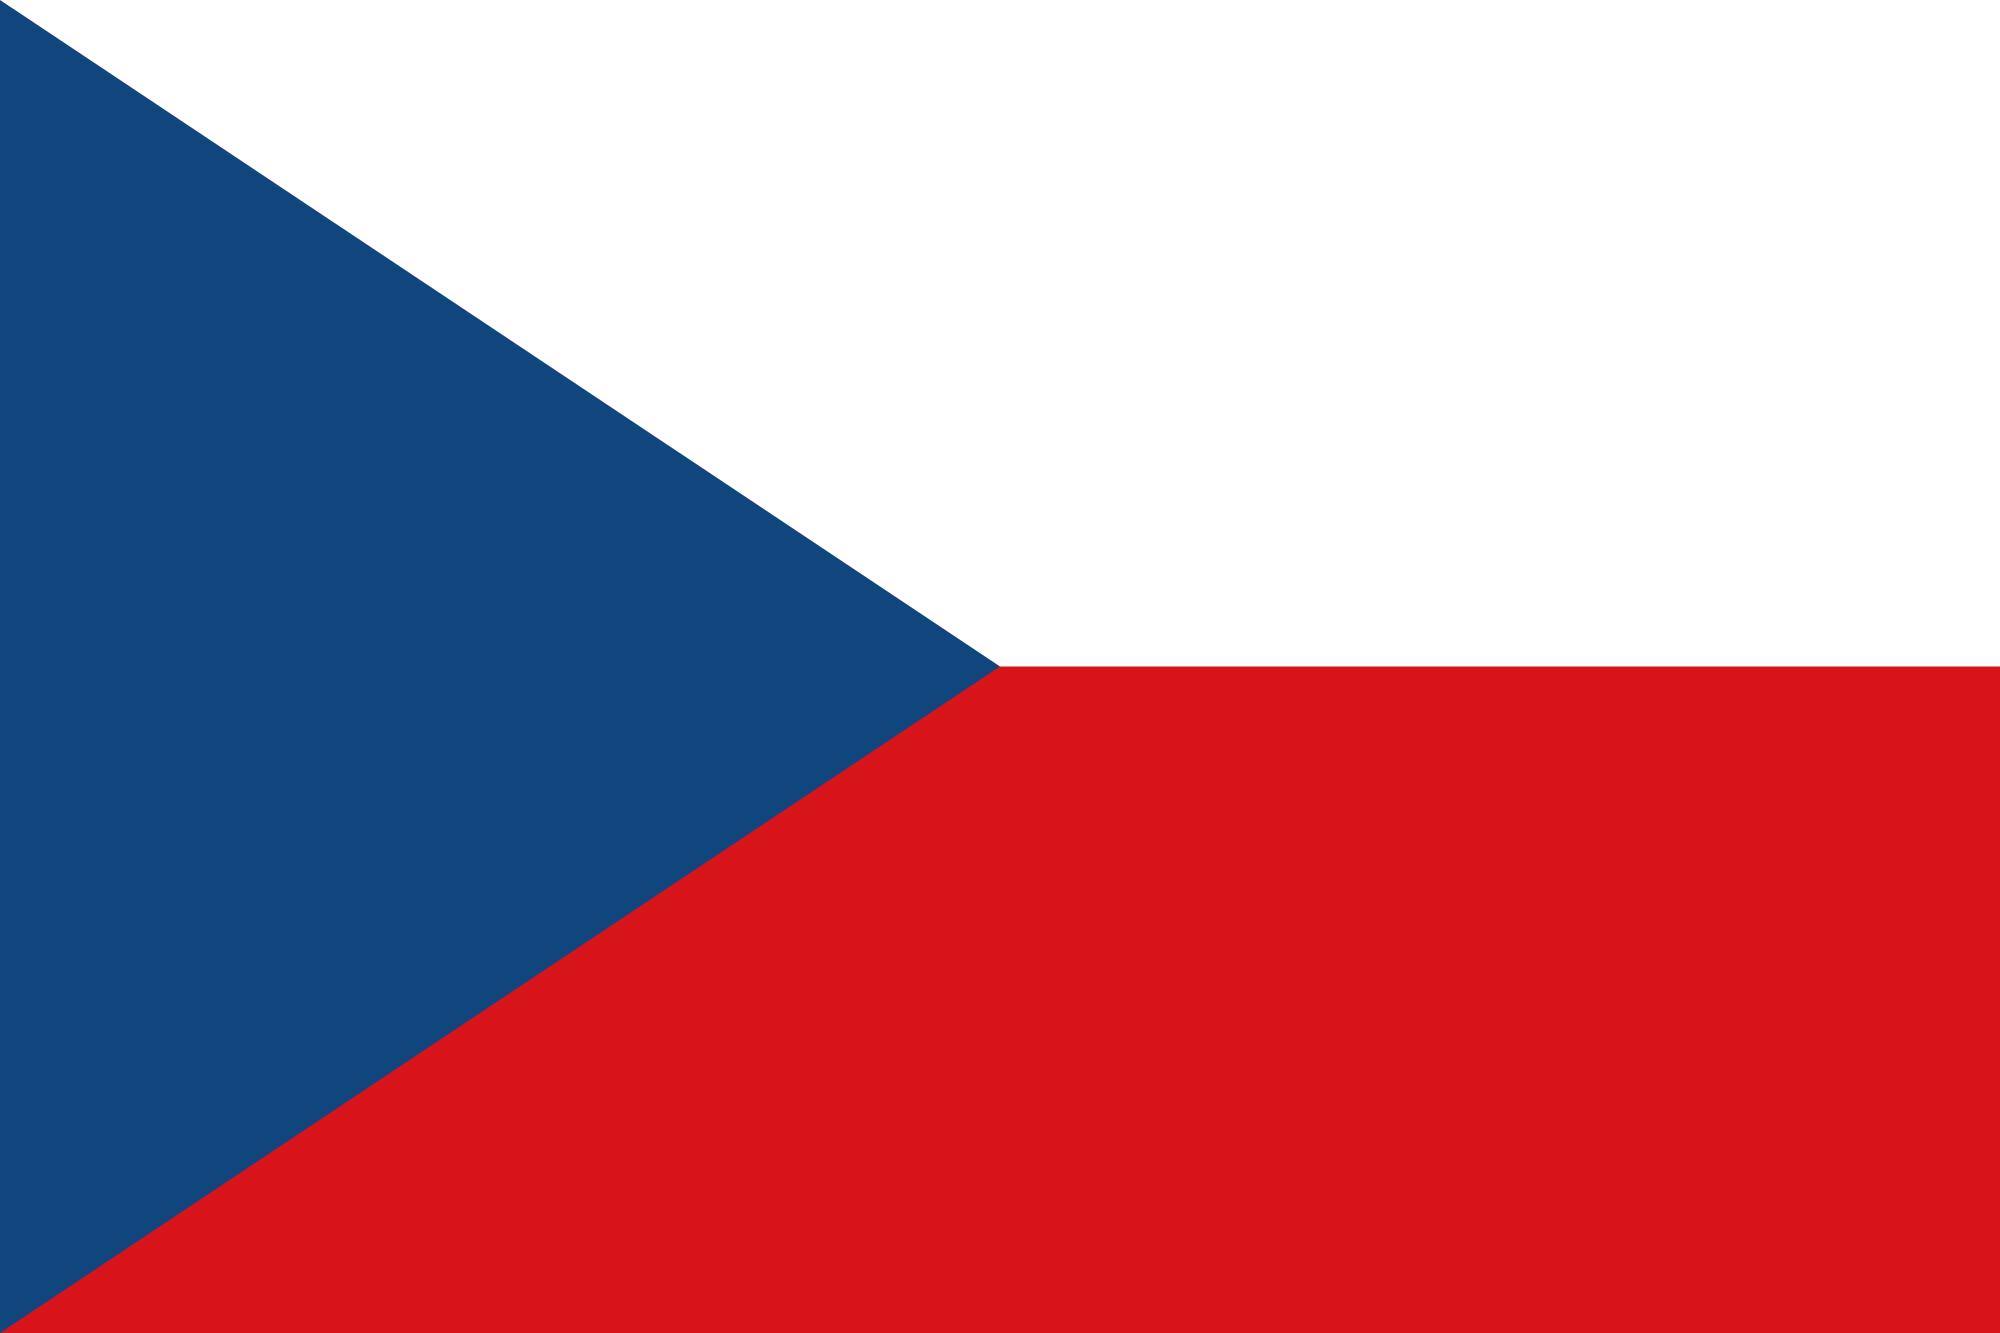 flag_of_the_czech_republic_svg